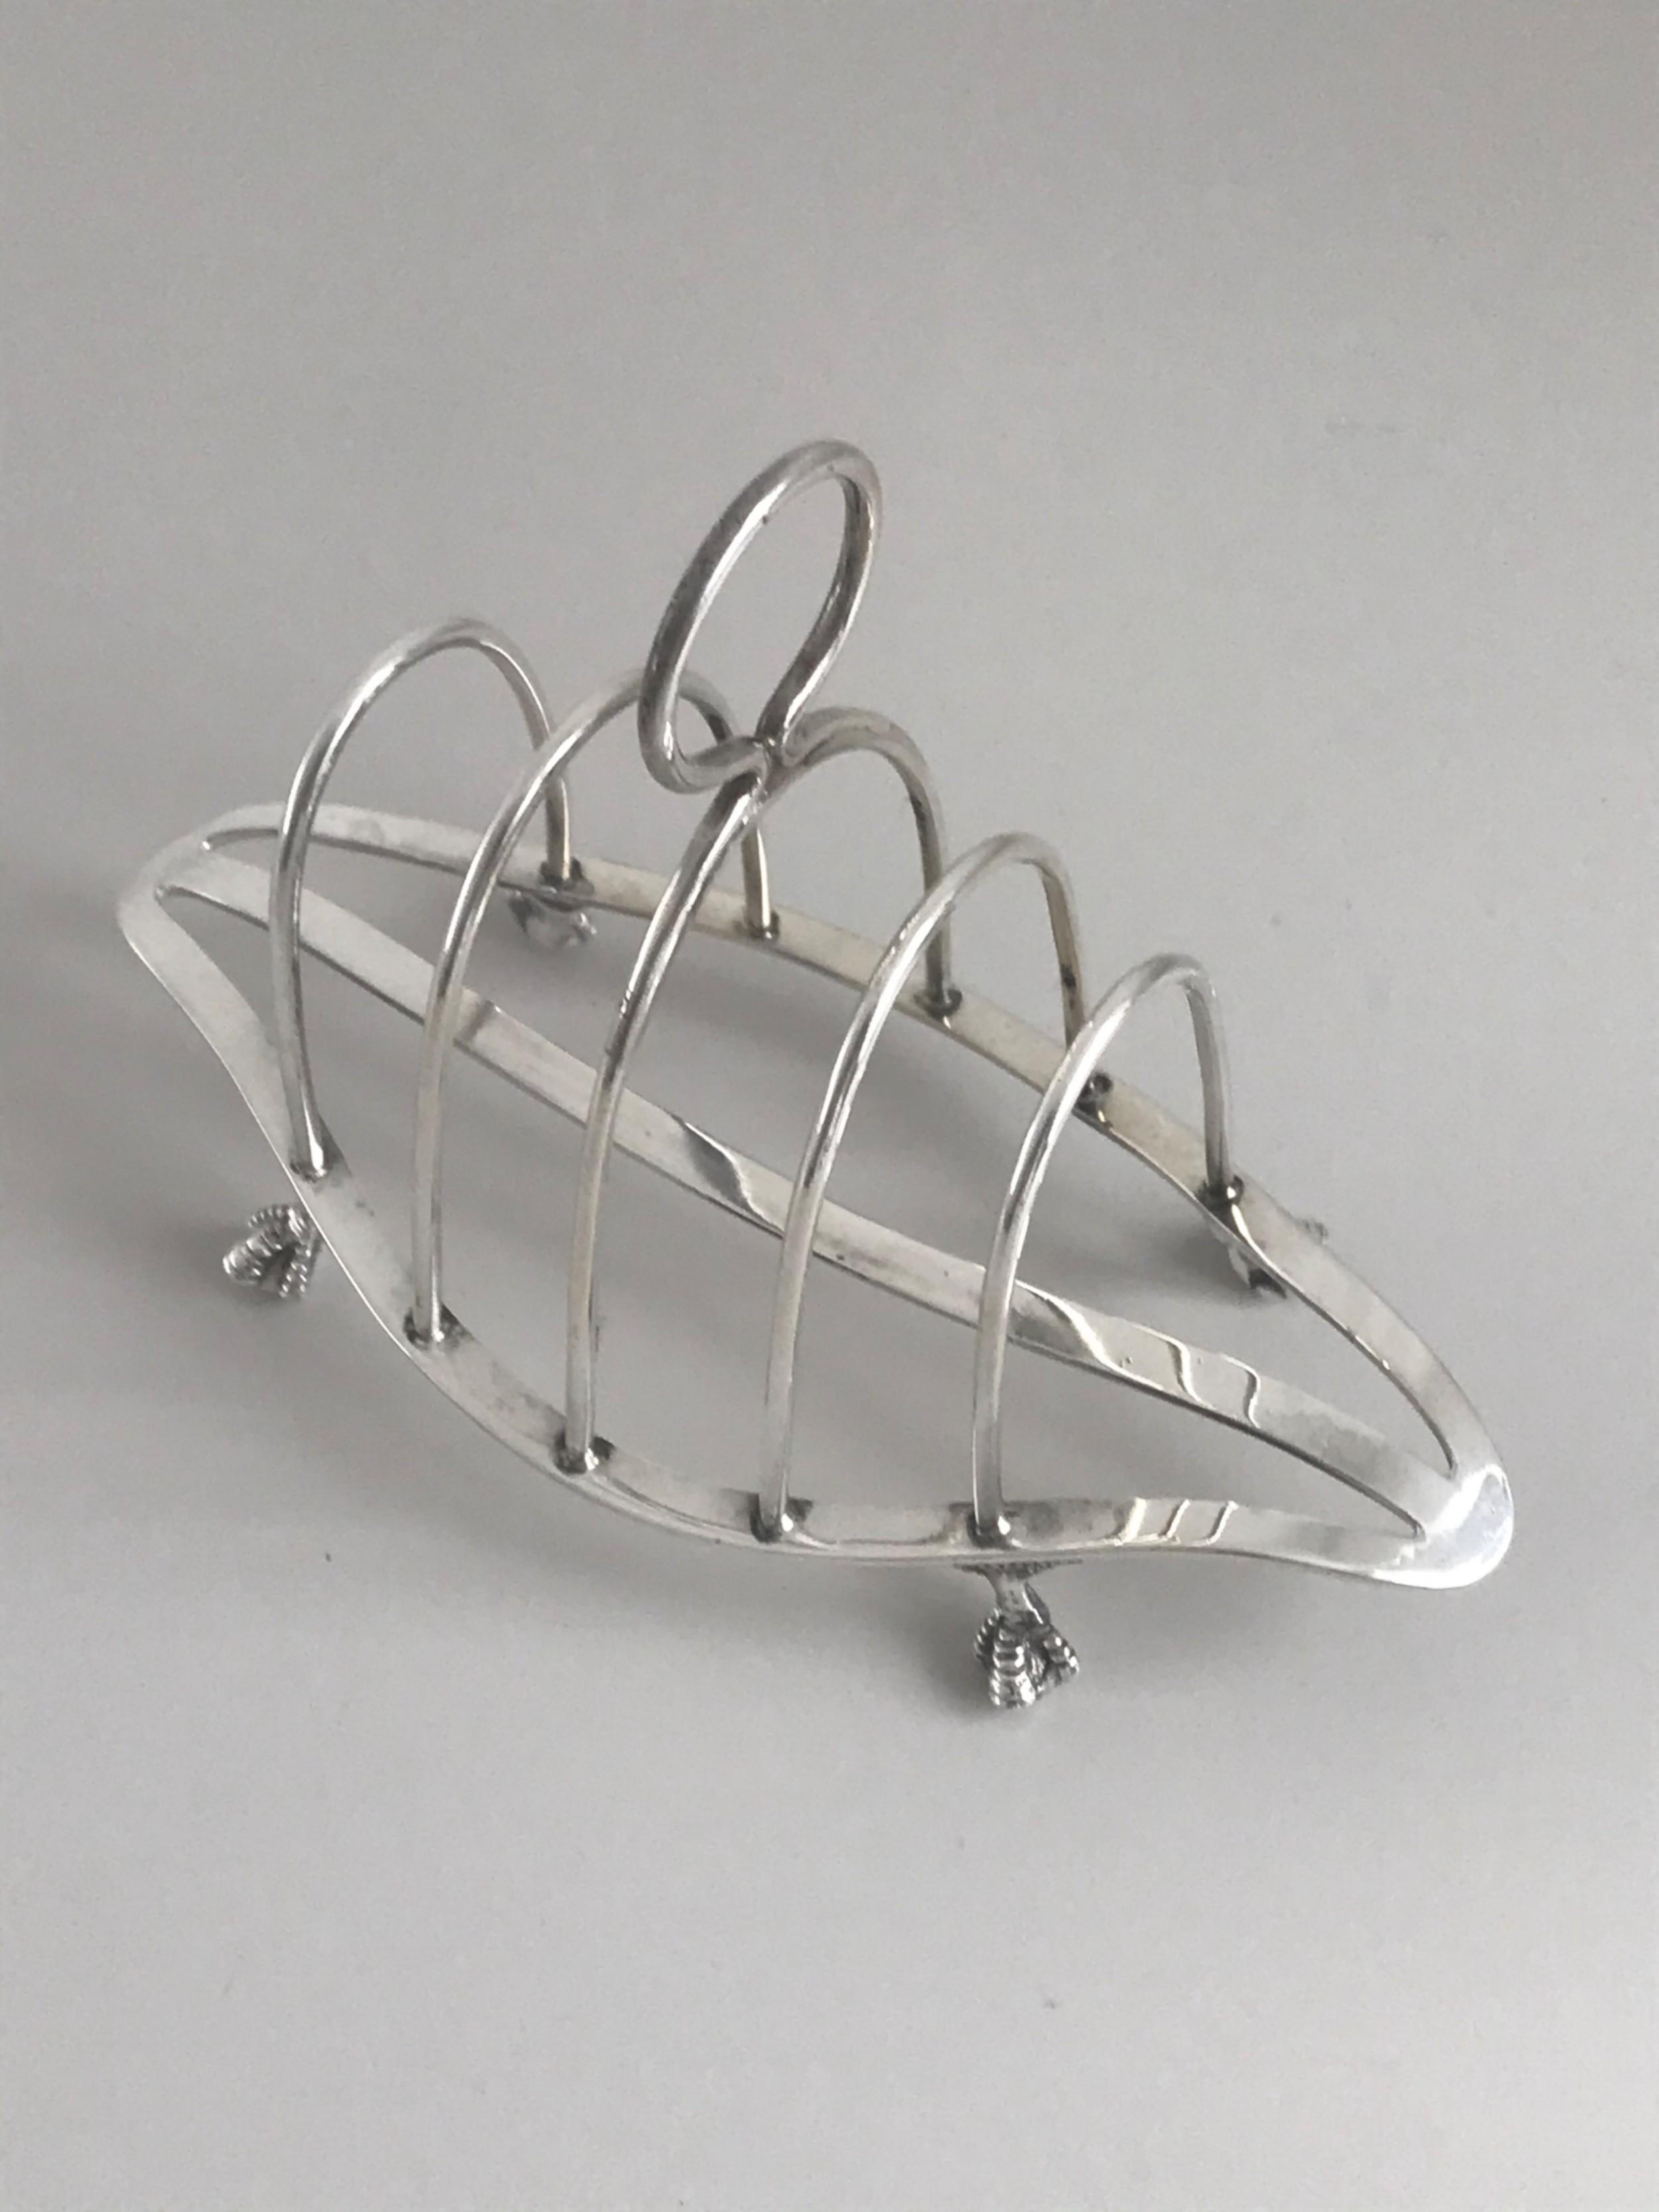 silver toast rack mappin brothers hallmarked london 1892